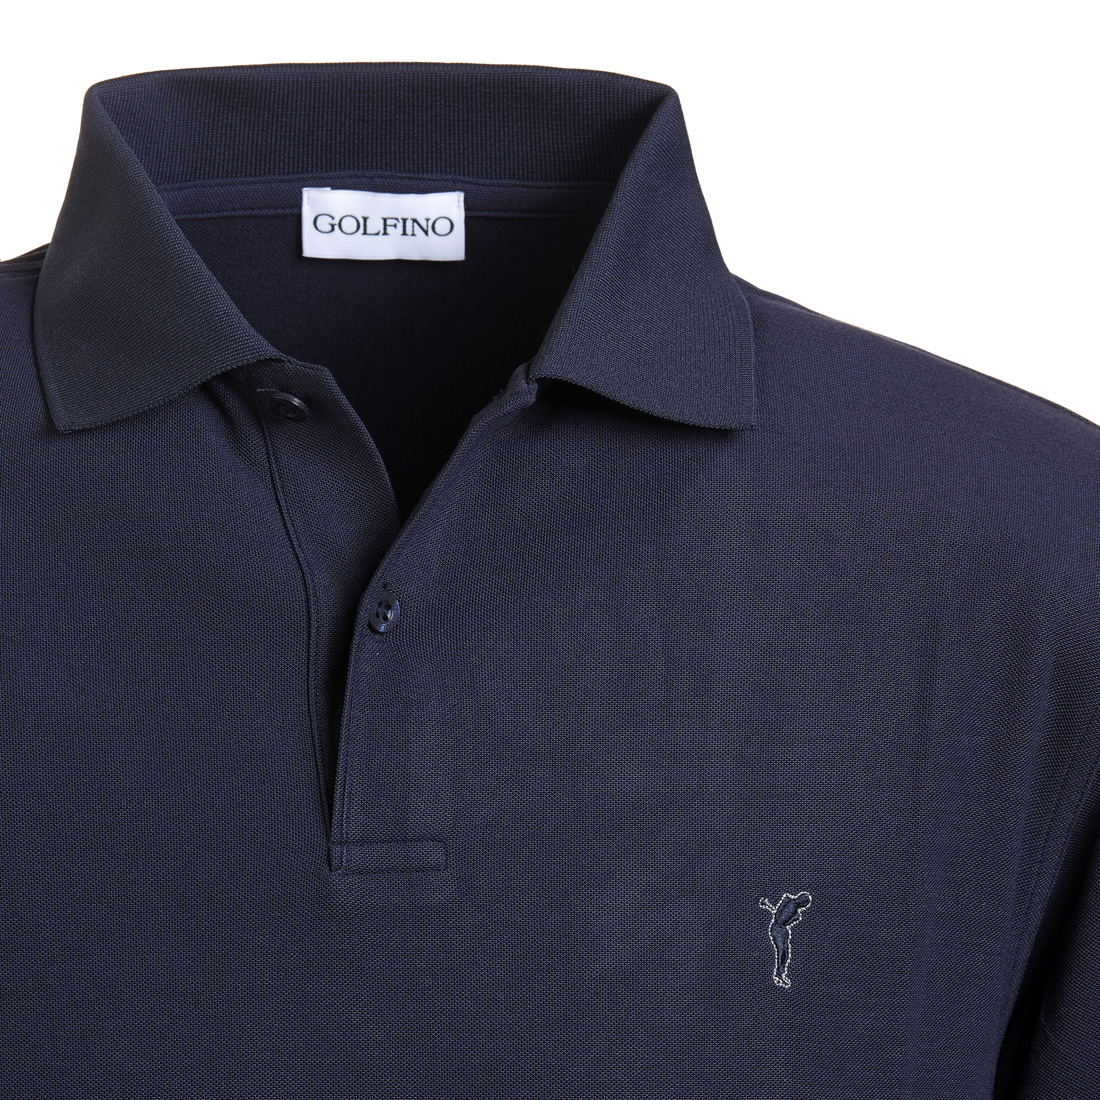 Herren Langarm Basic-Golfpolo mit Moisture Management in Regular Fit